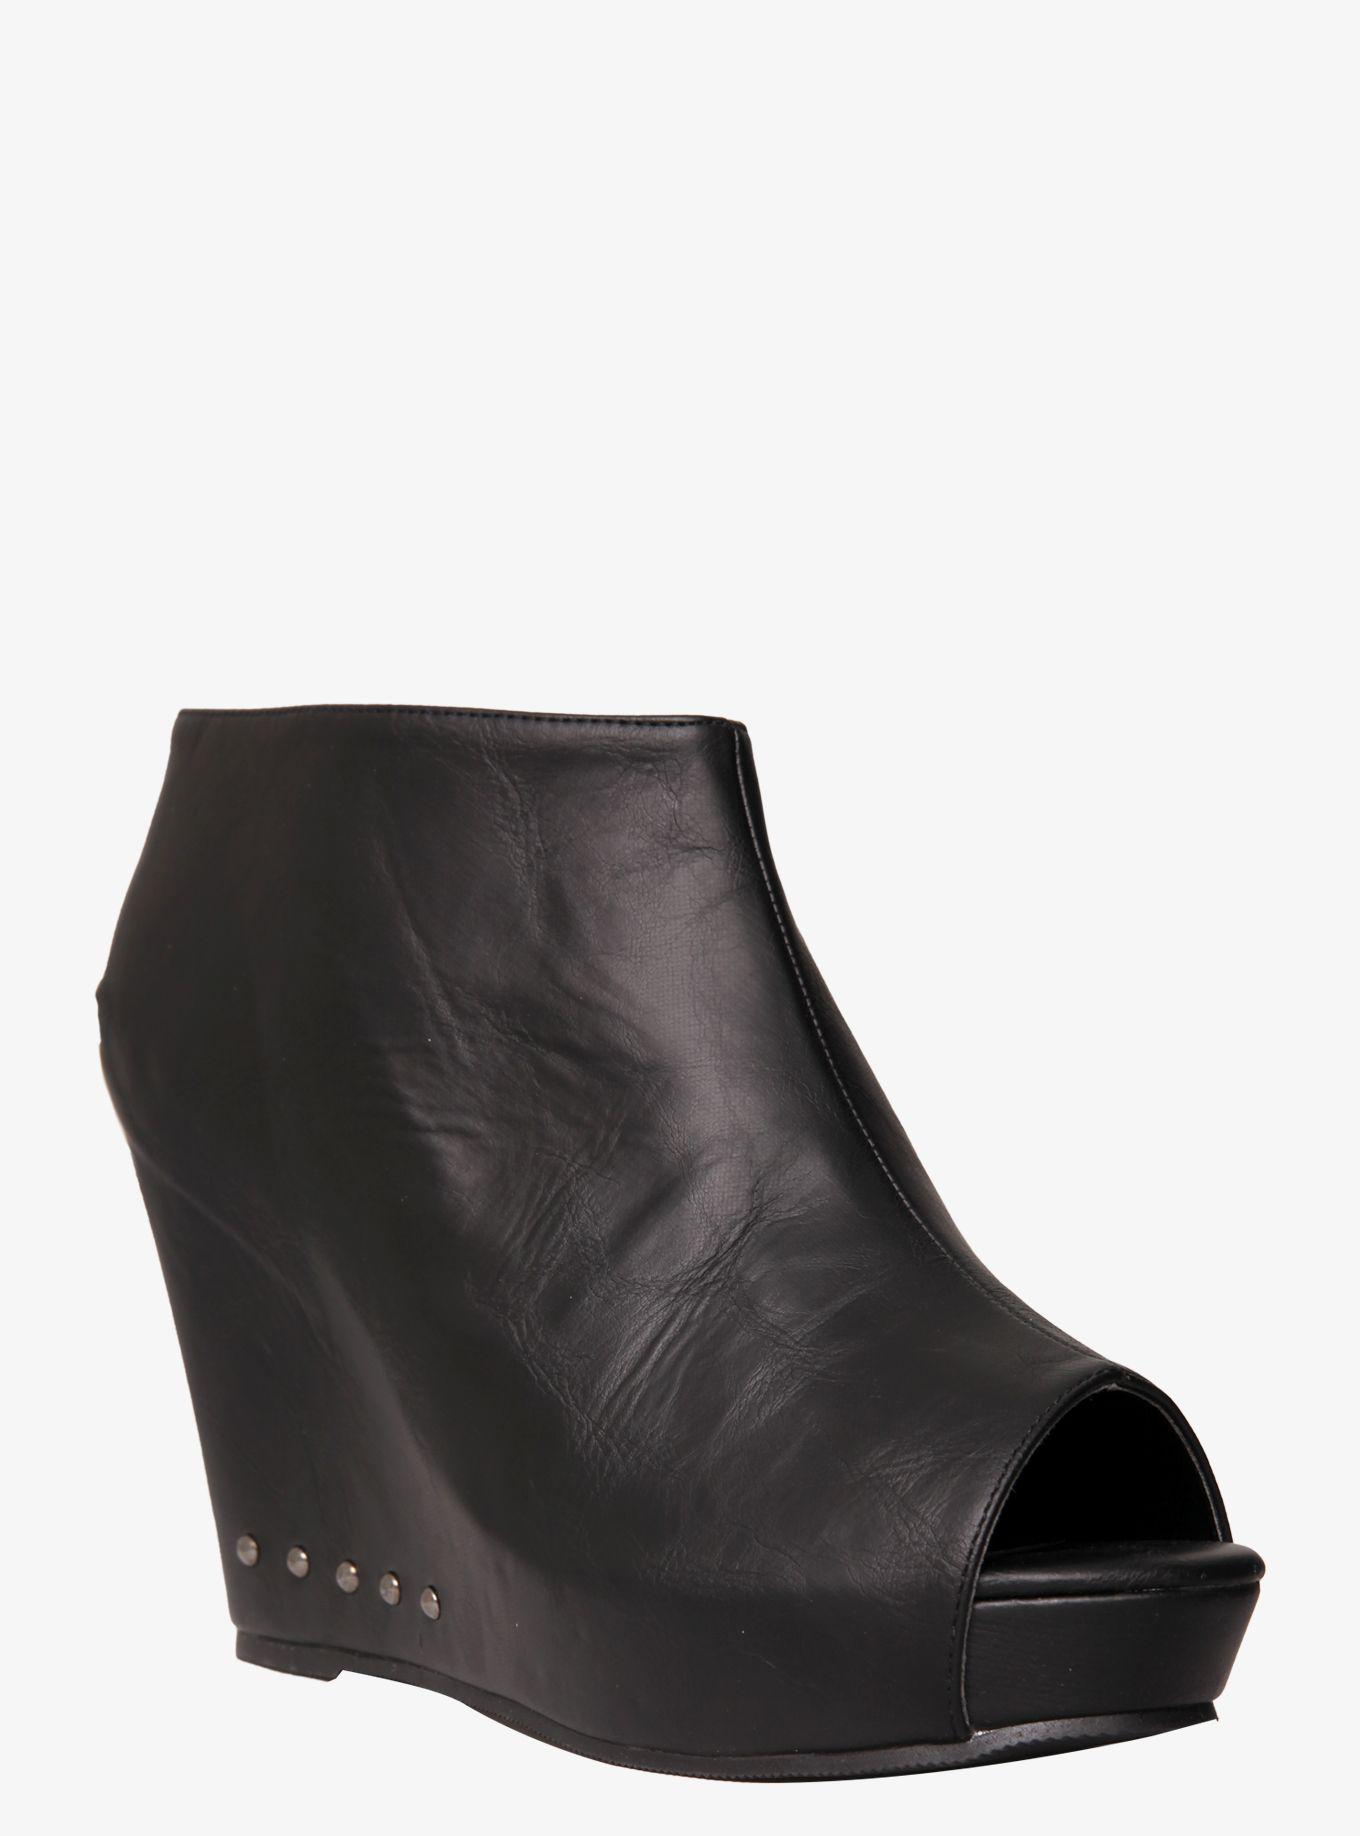 d8712588a625 Black Studded Peep Toe Wedge Booties (Wide Width)